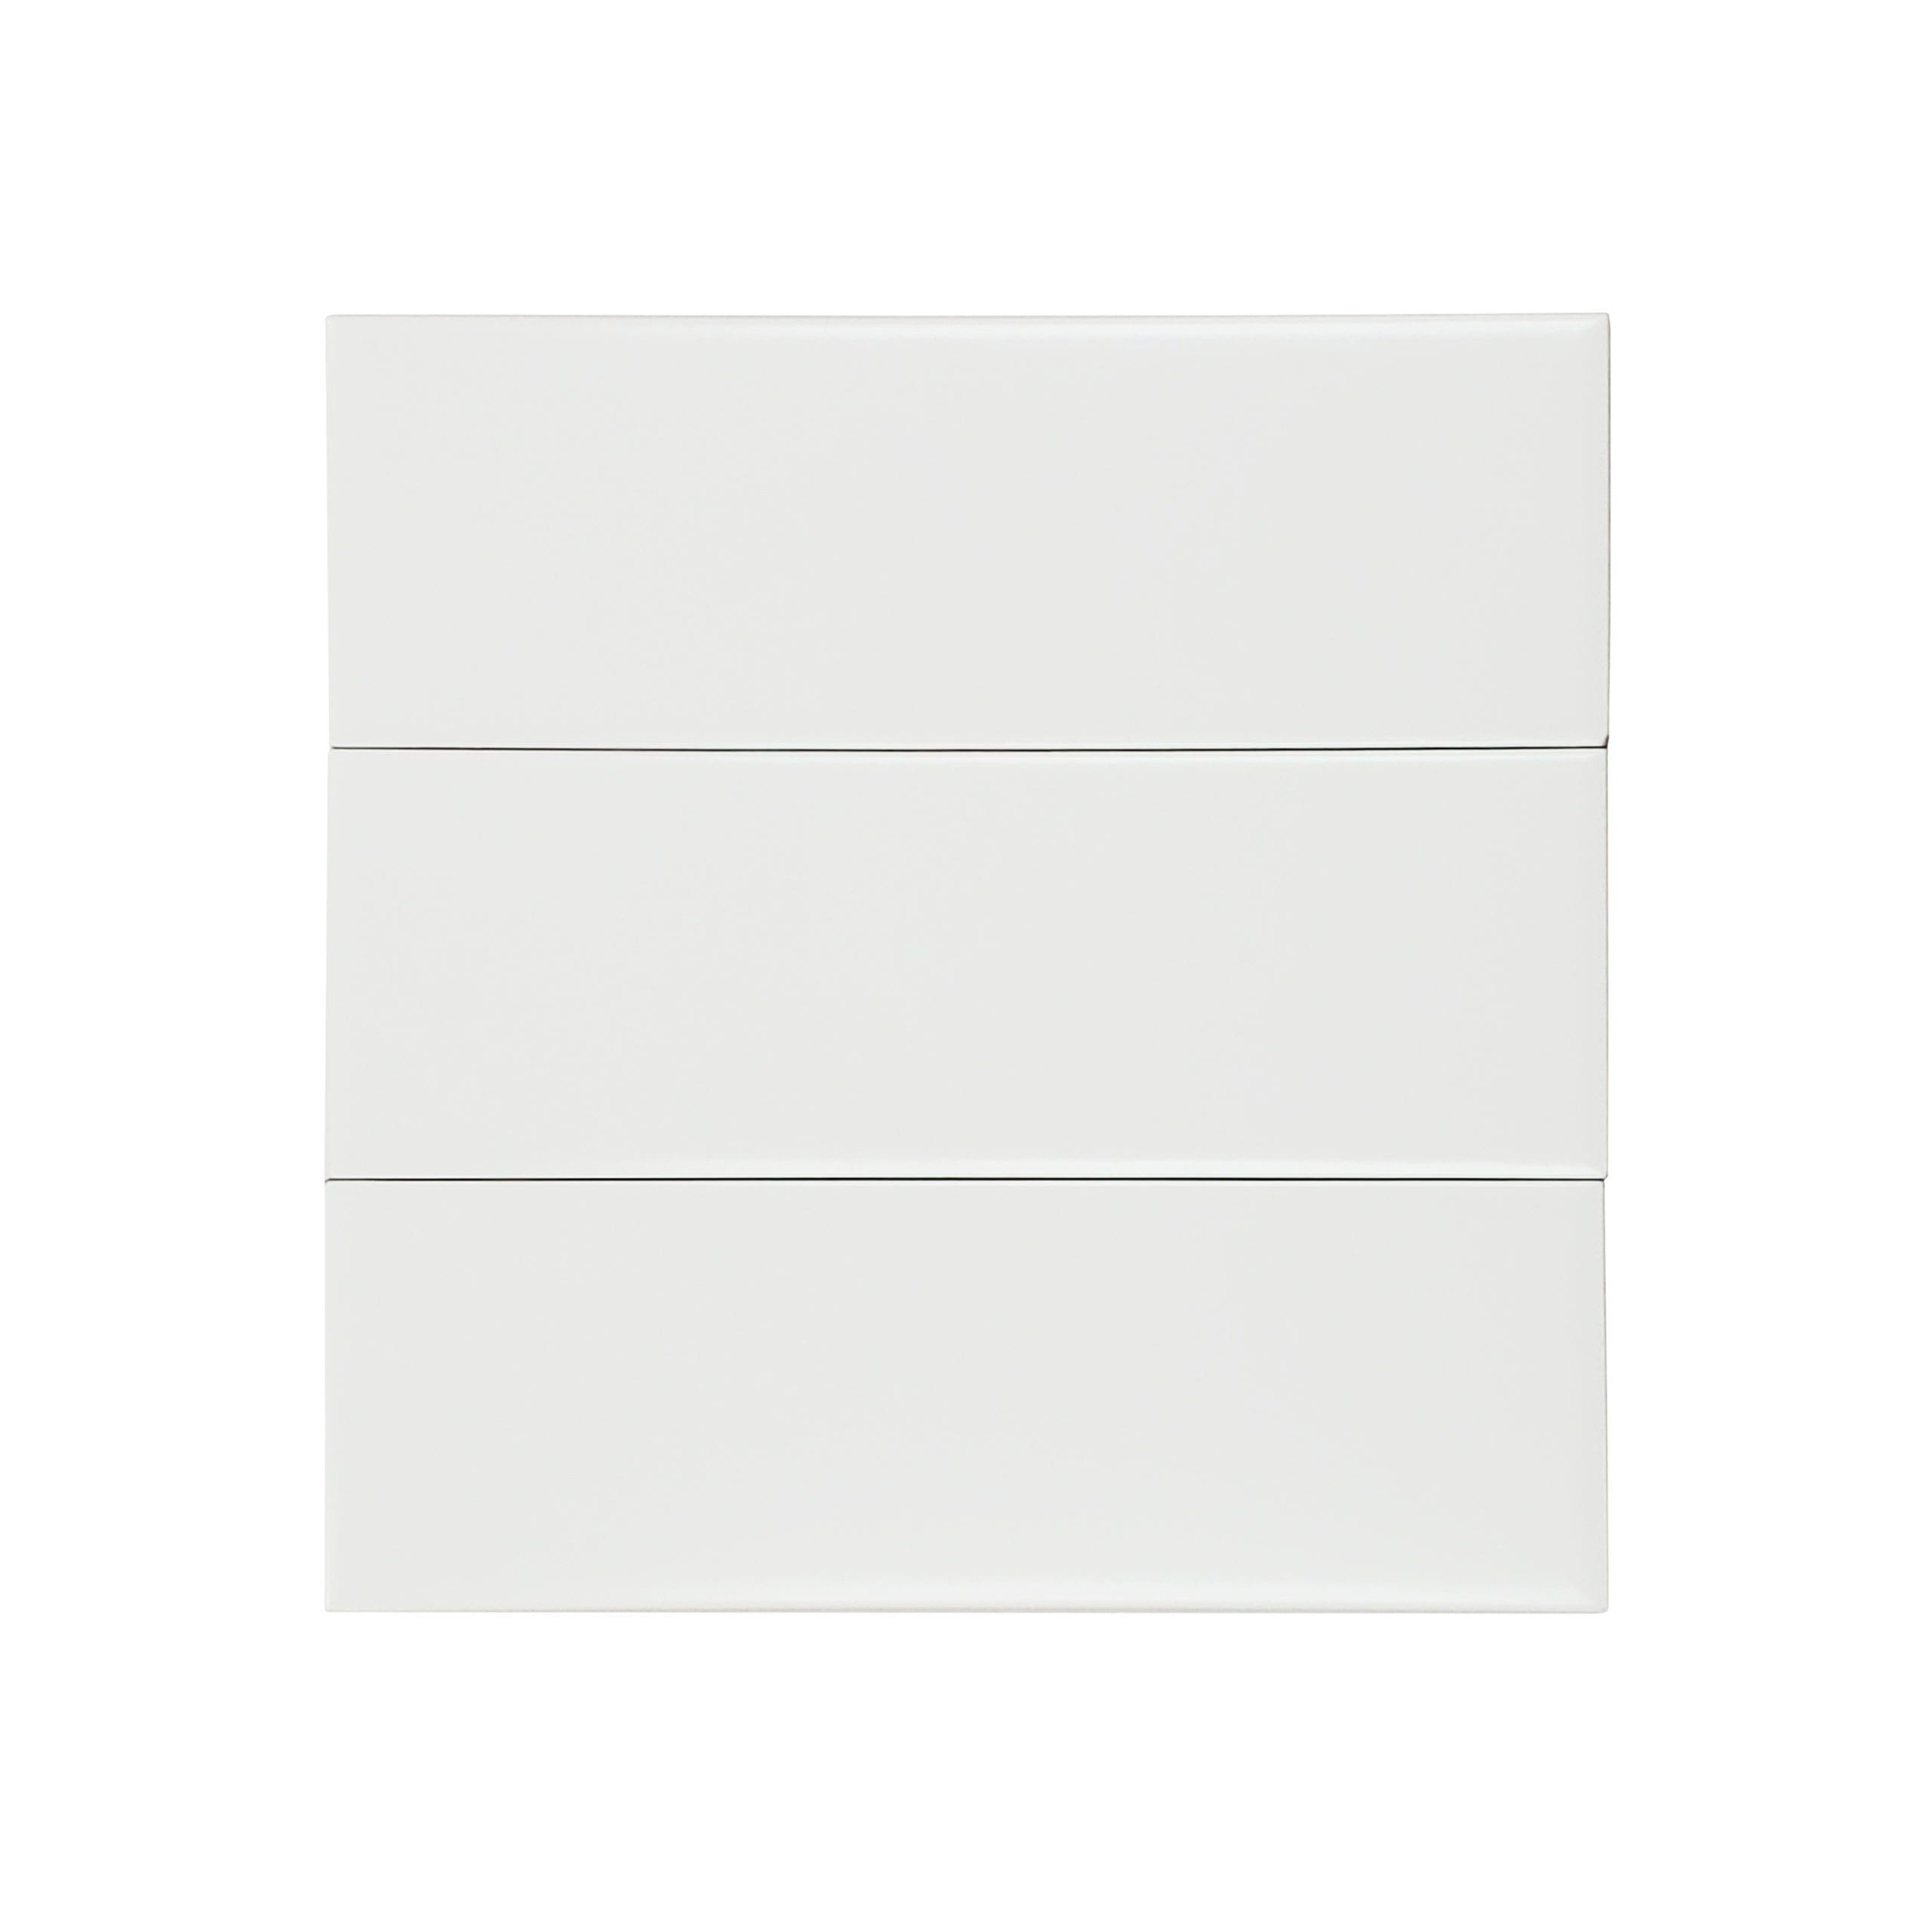 4×12 Snow Flat Matte Subway Tile_White_10.33sfct_3.49_2.29